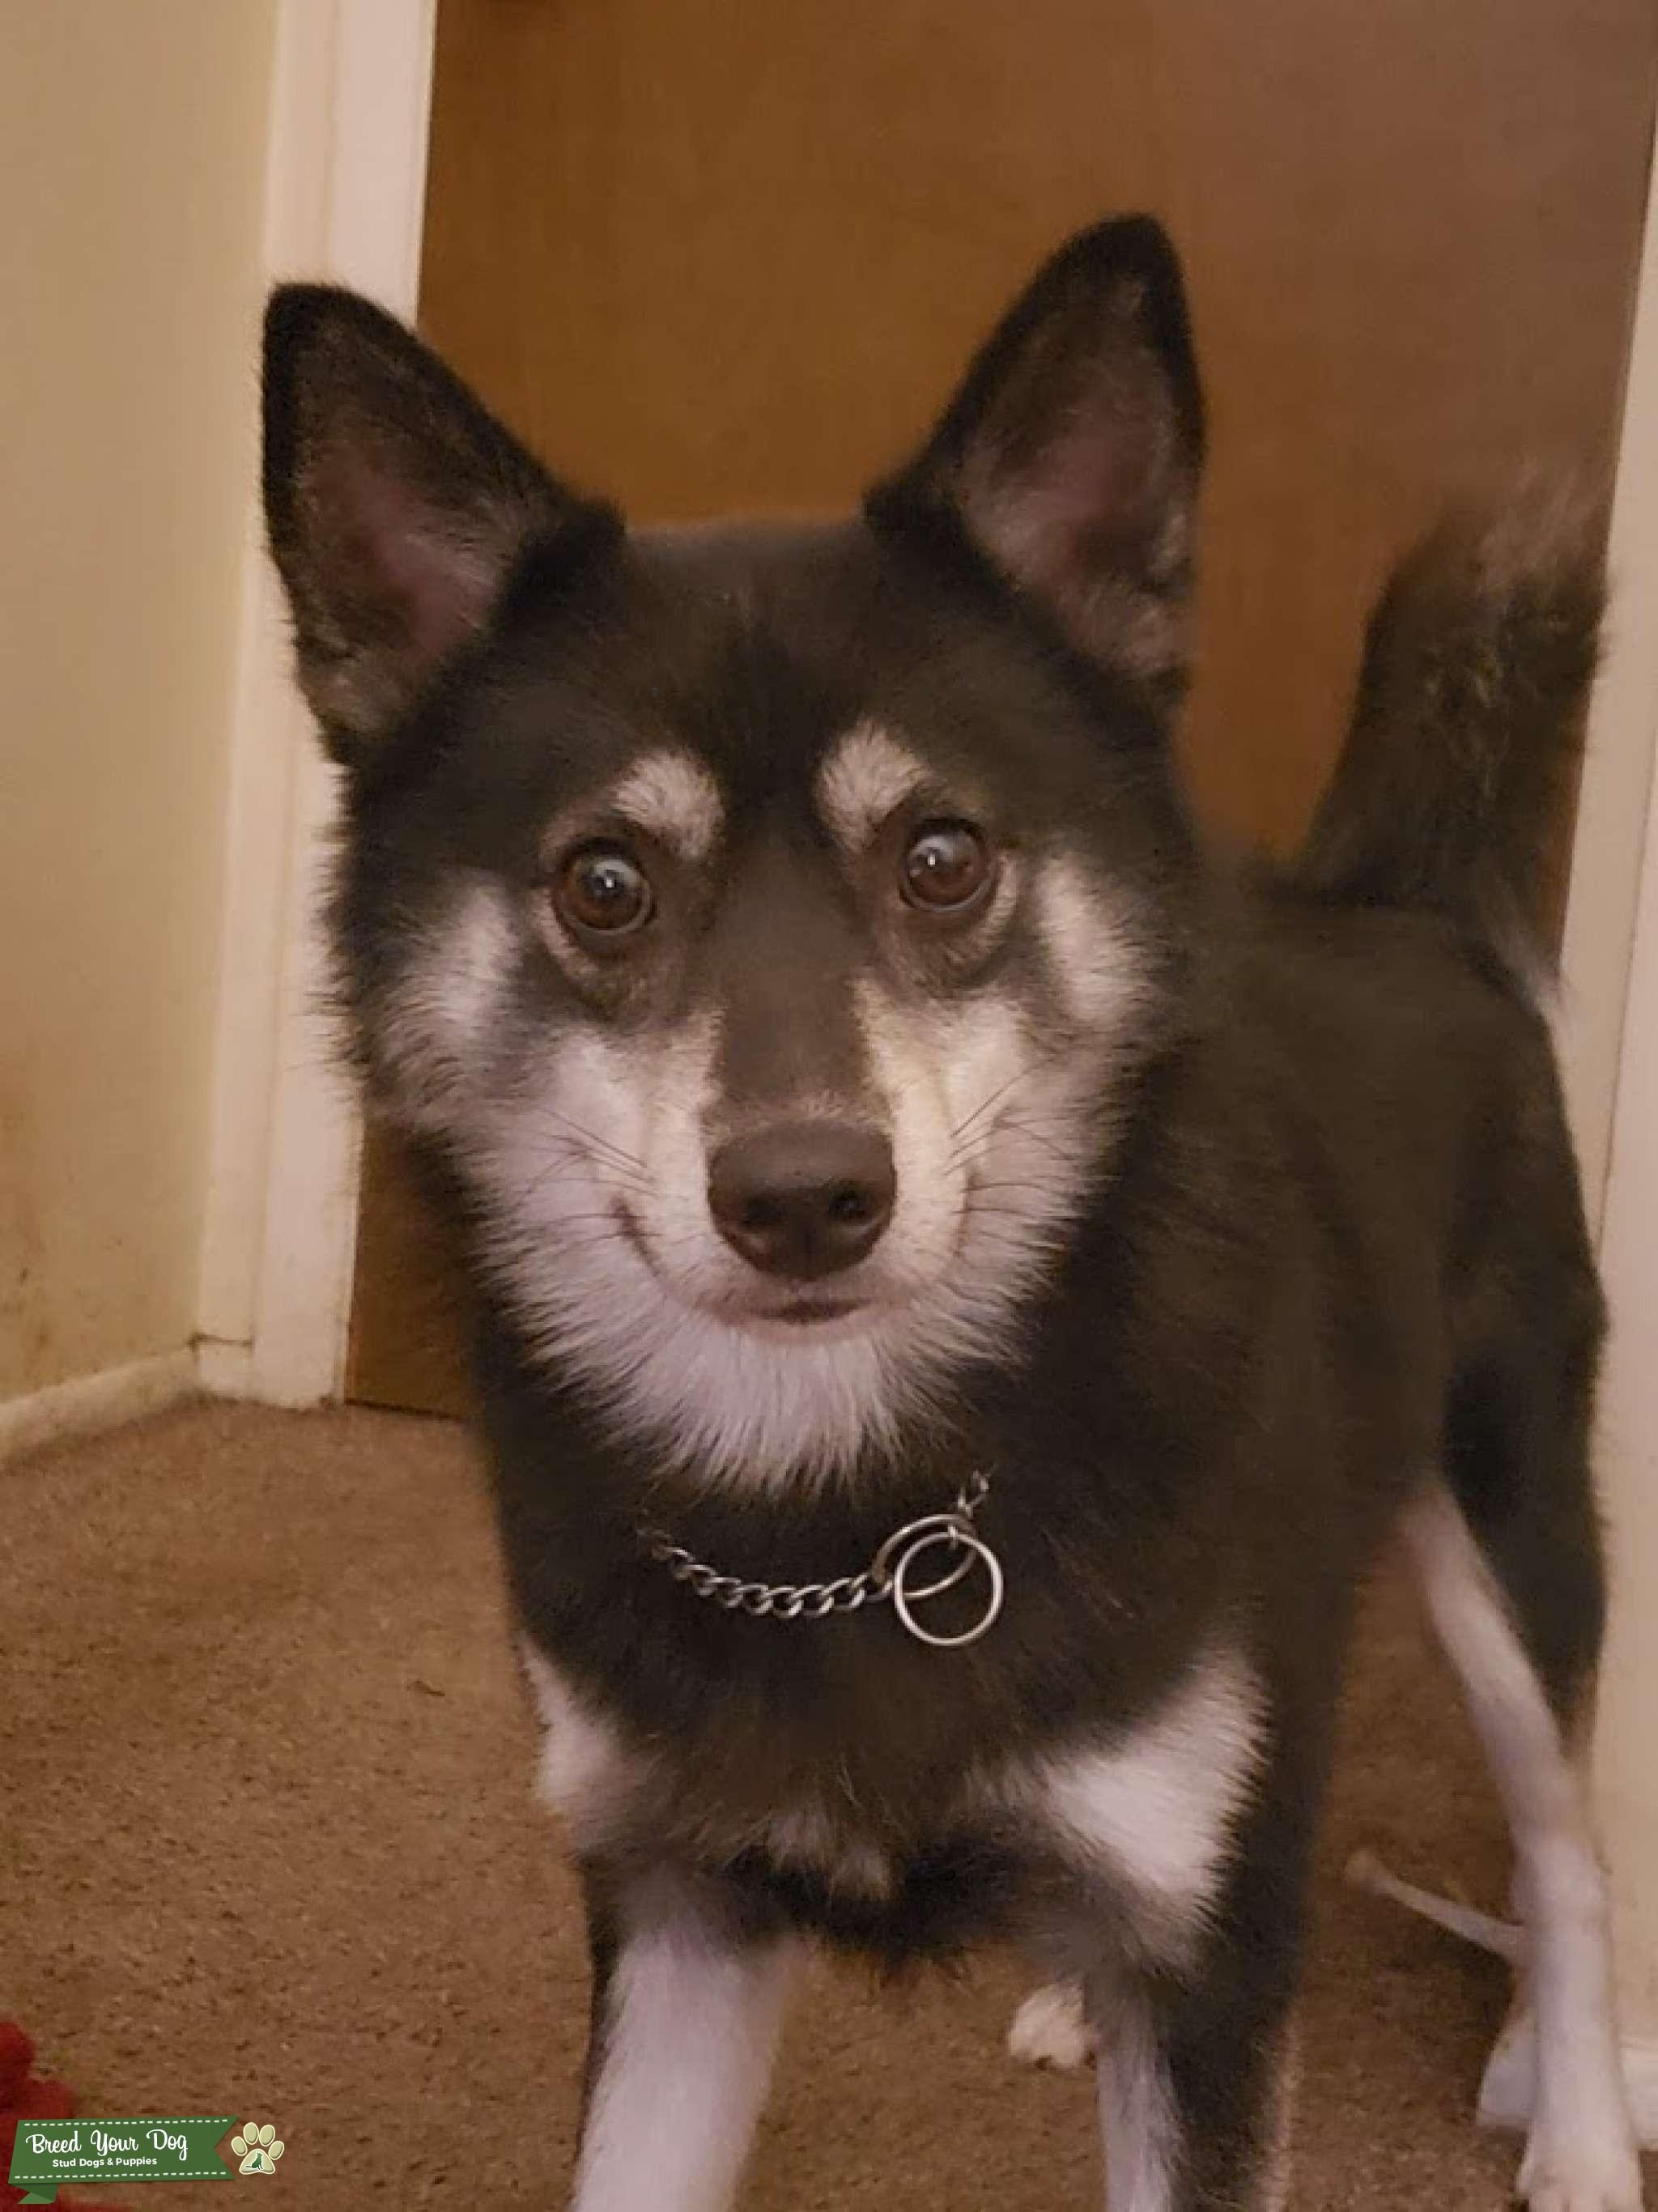 2.5-3yr old Black/Silver Pomsky with Brown eyes Listing Image Big